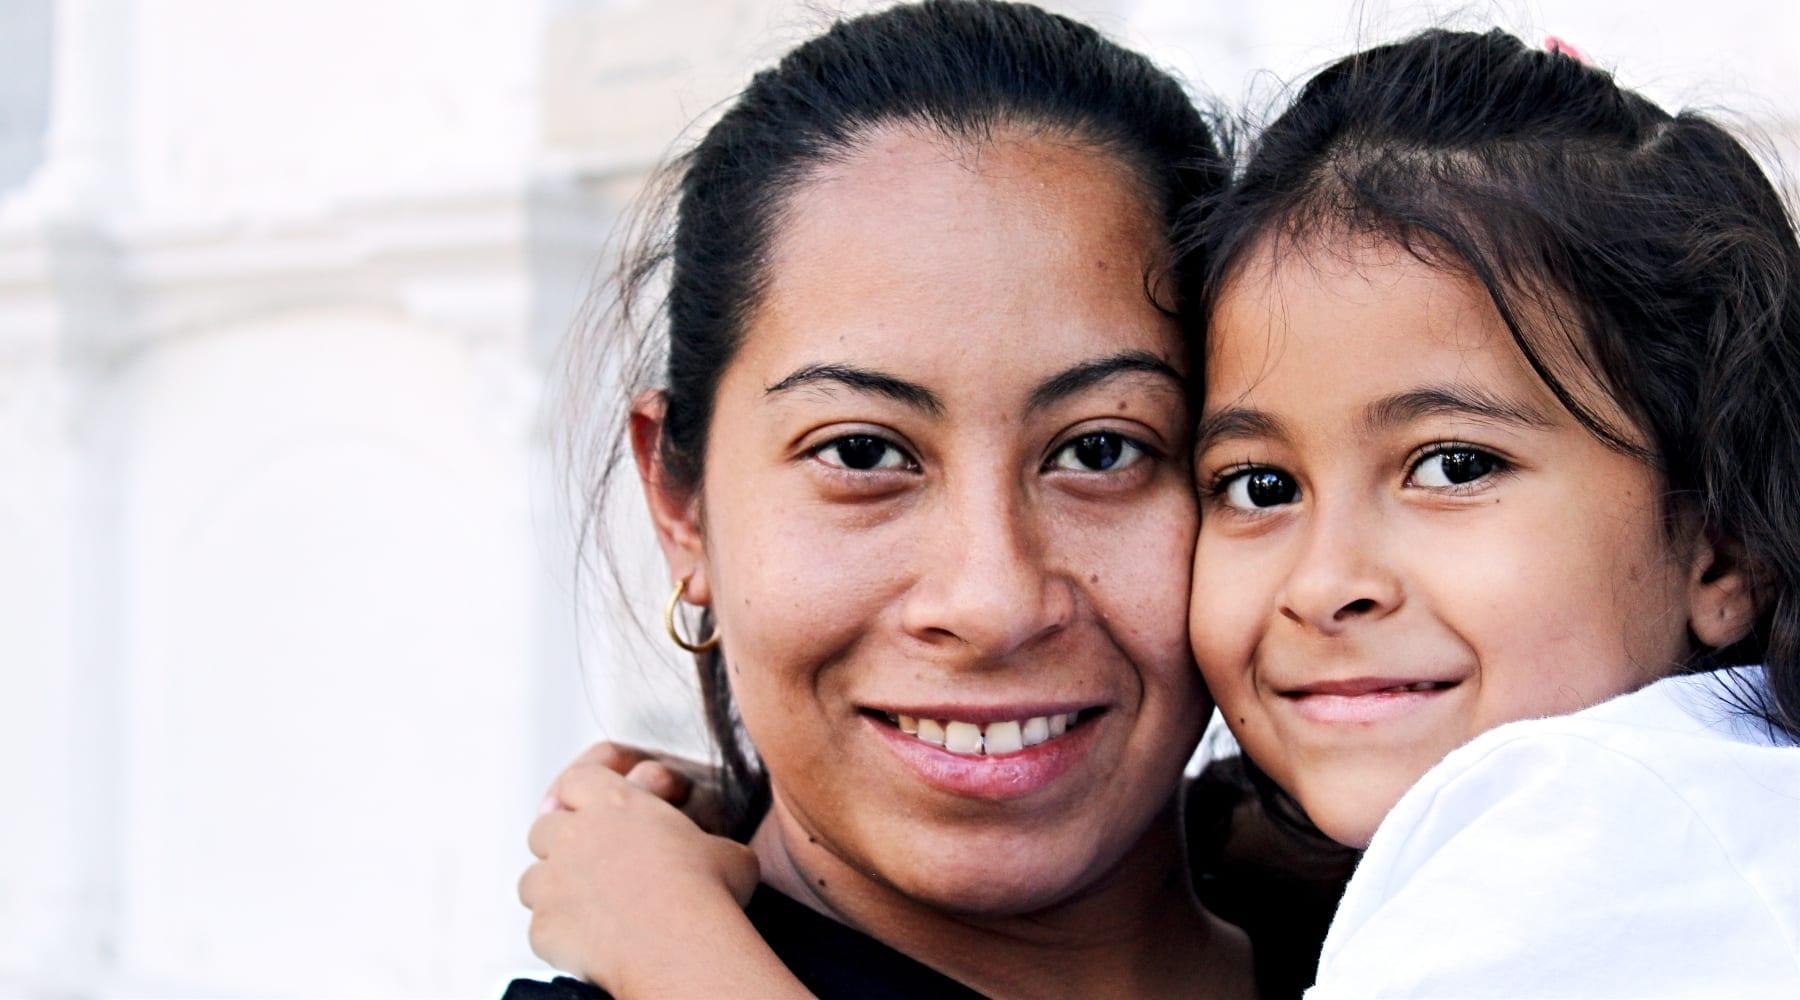 Undocumented Immigration Declines; Mexicans No Longer Majority